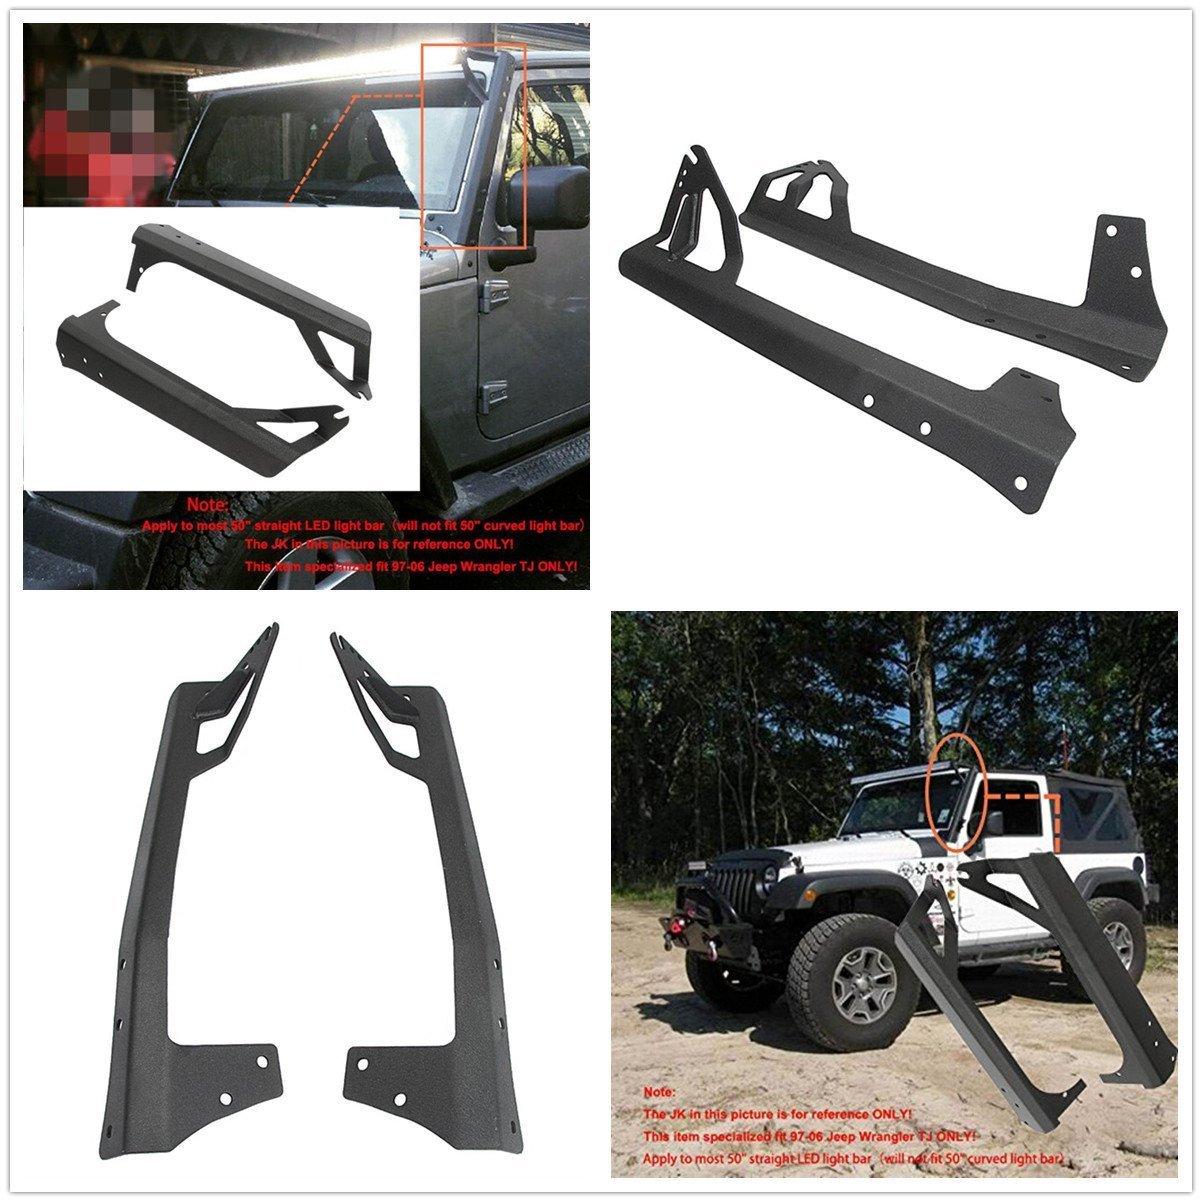 Fit Jeep Wrangler Jk 2007 2017 Offroad Light Bar Kit Powlab 52 Inch Wiring Harness For 6000k